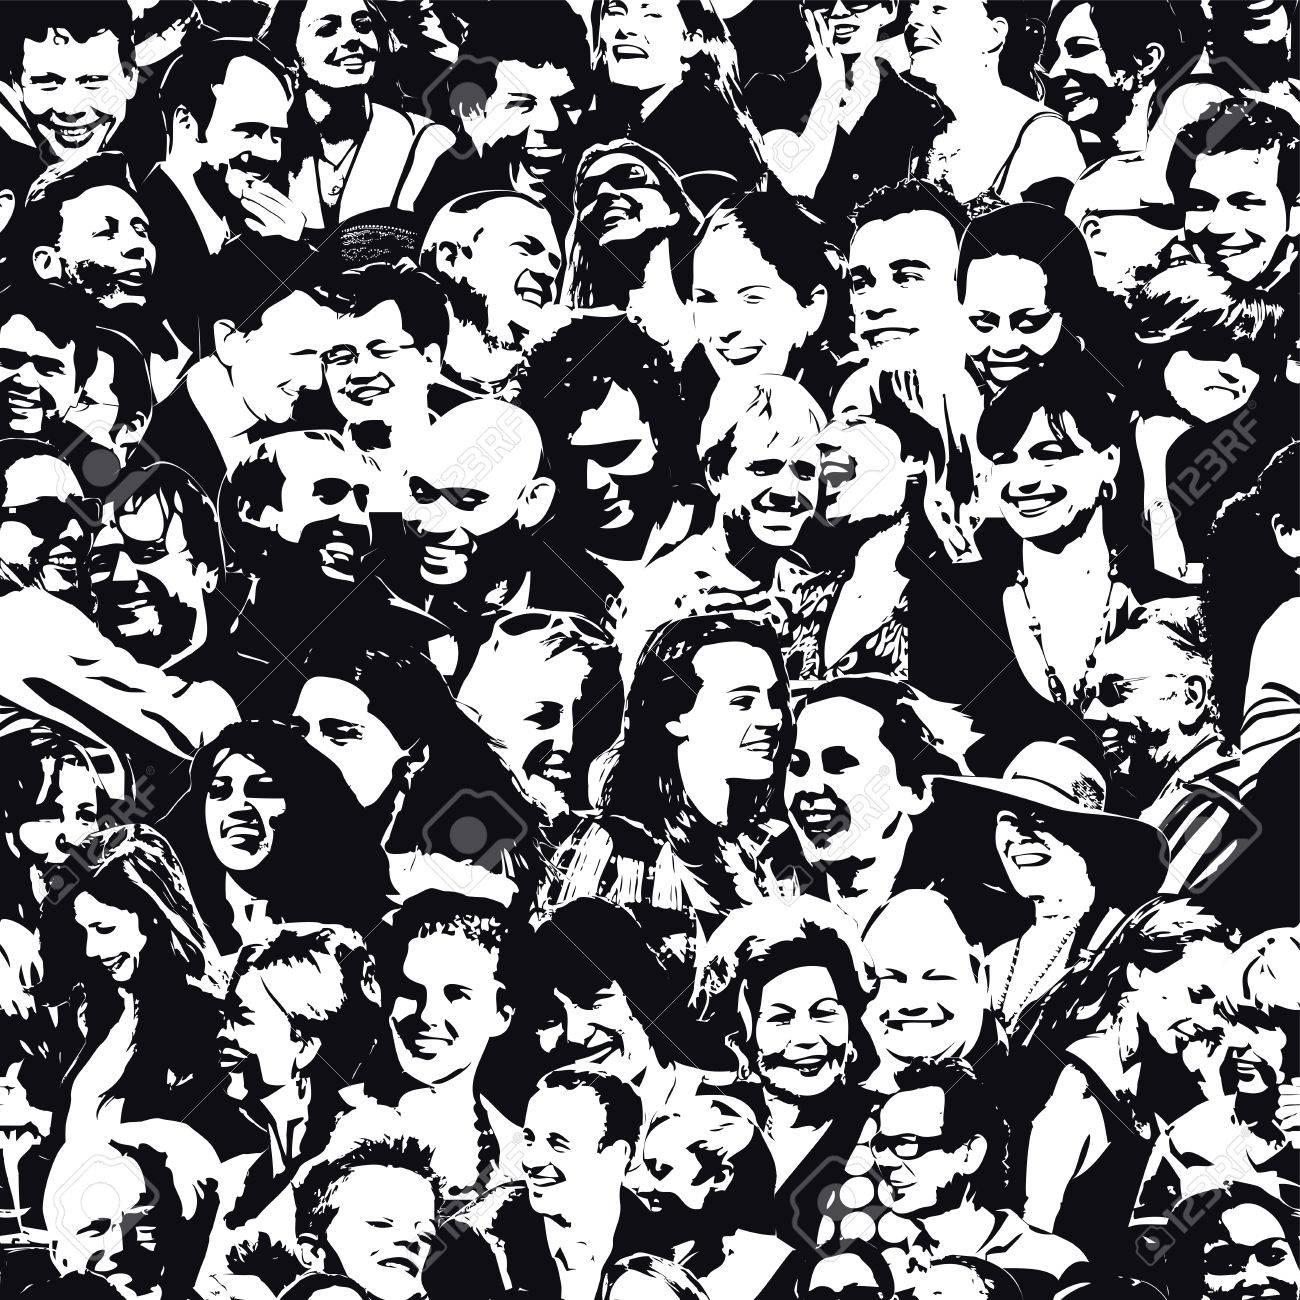 Happy People Background - 53979893